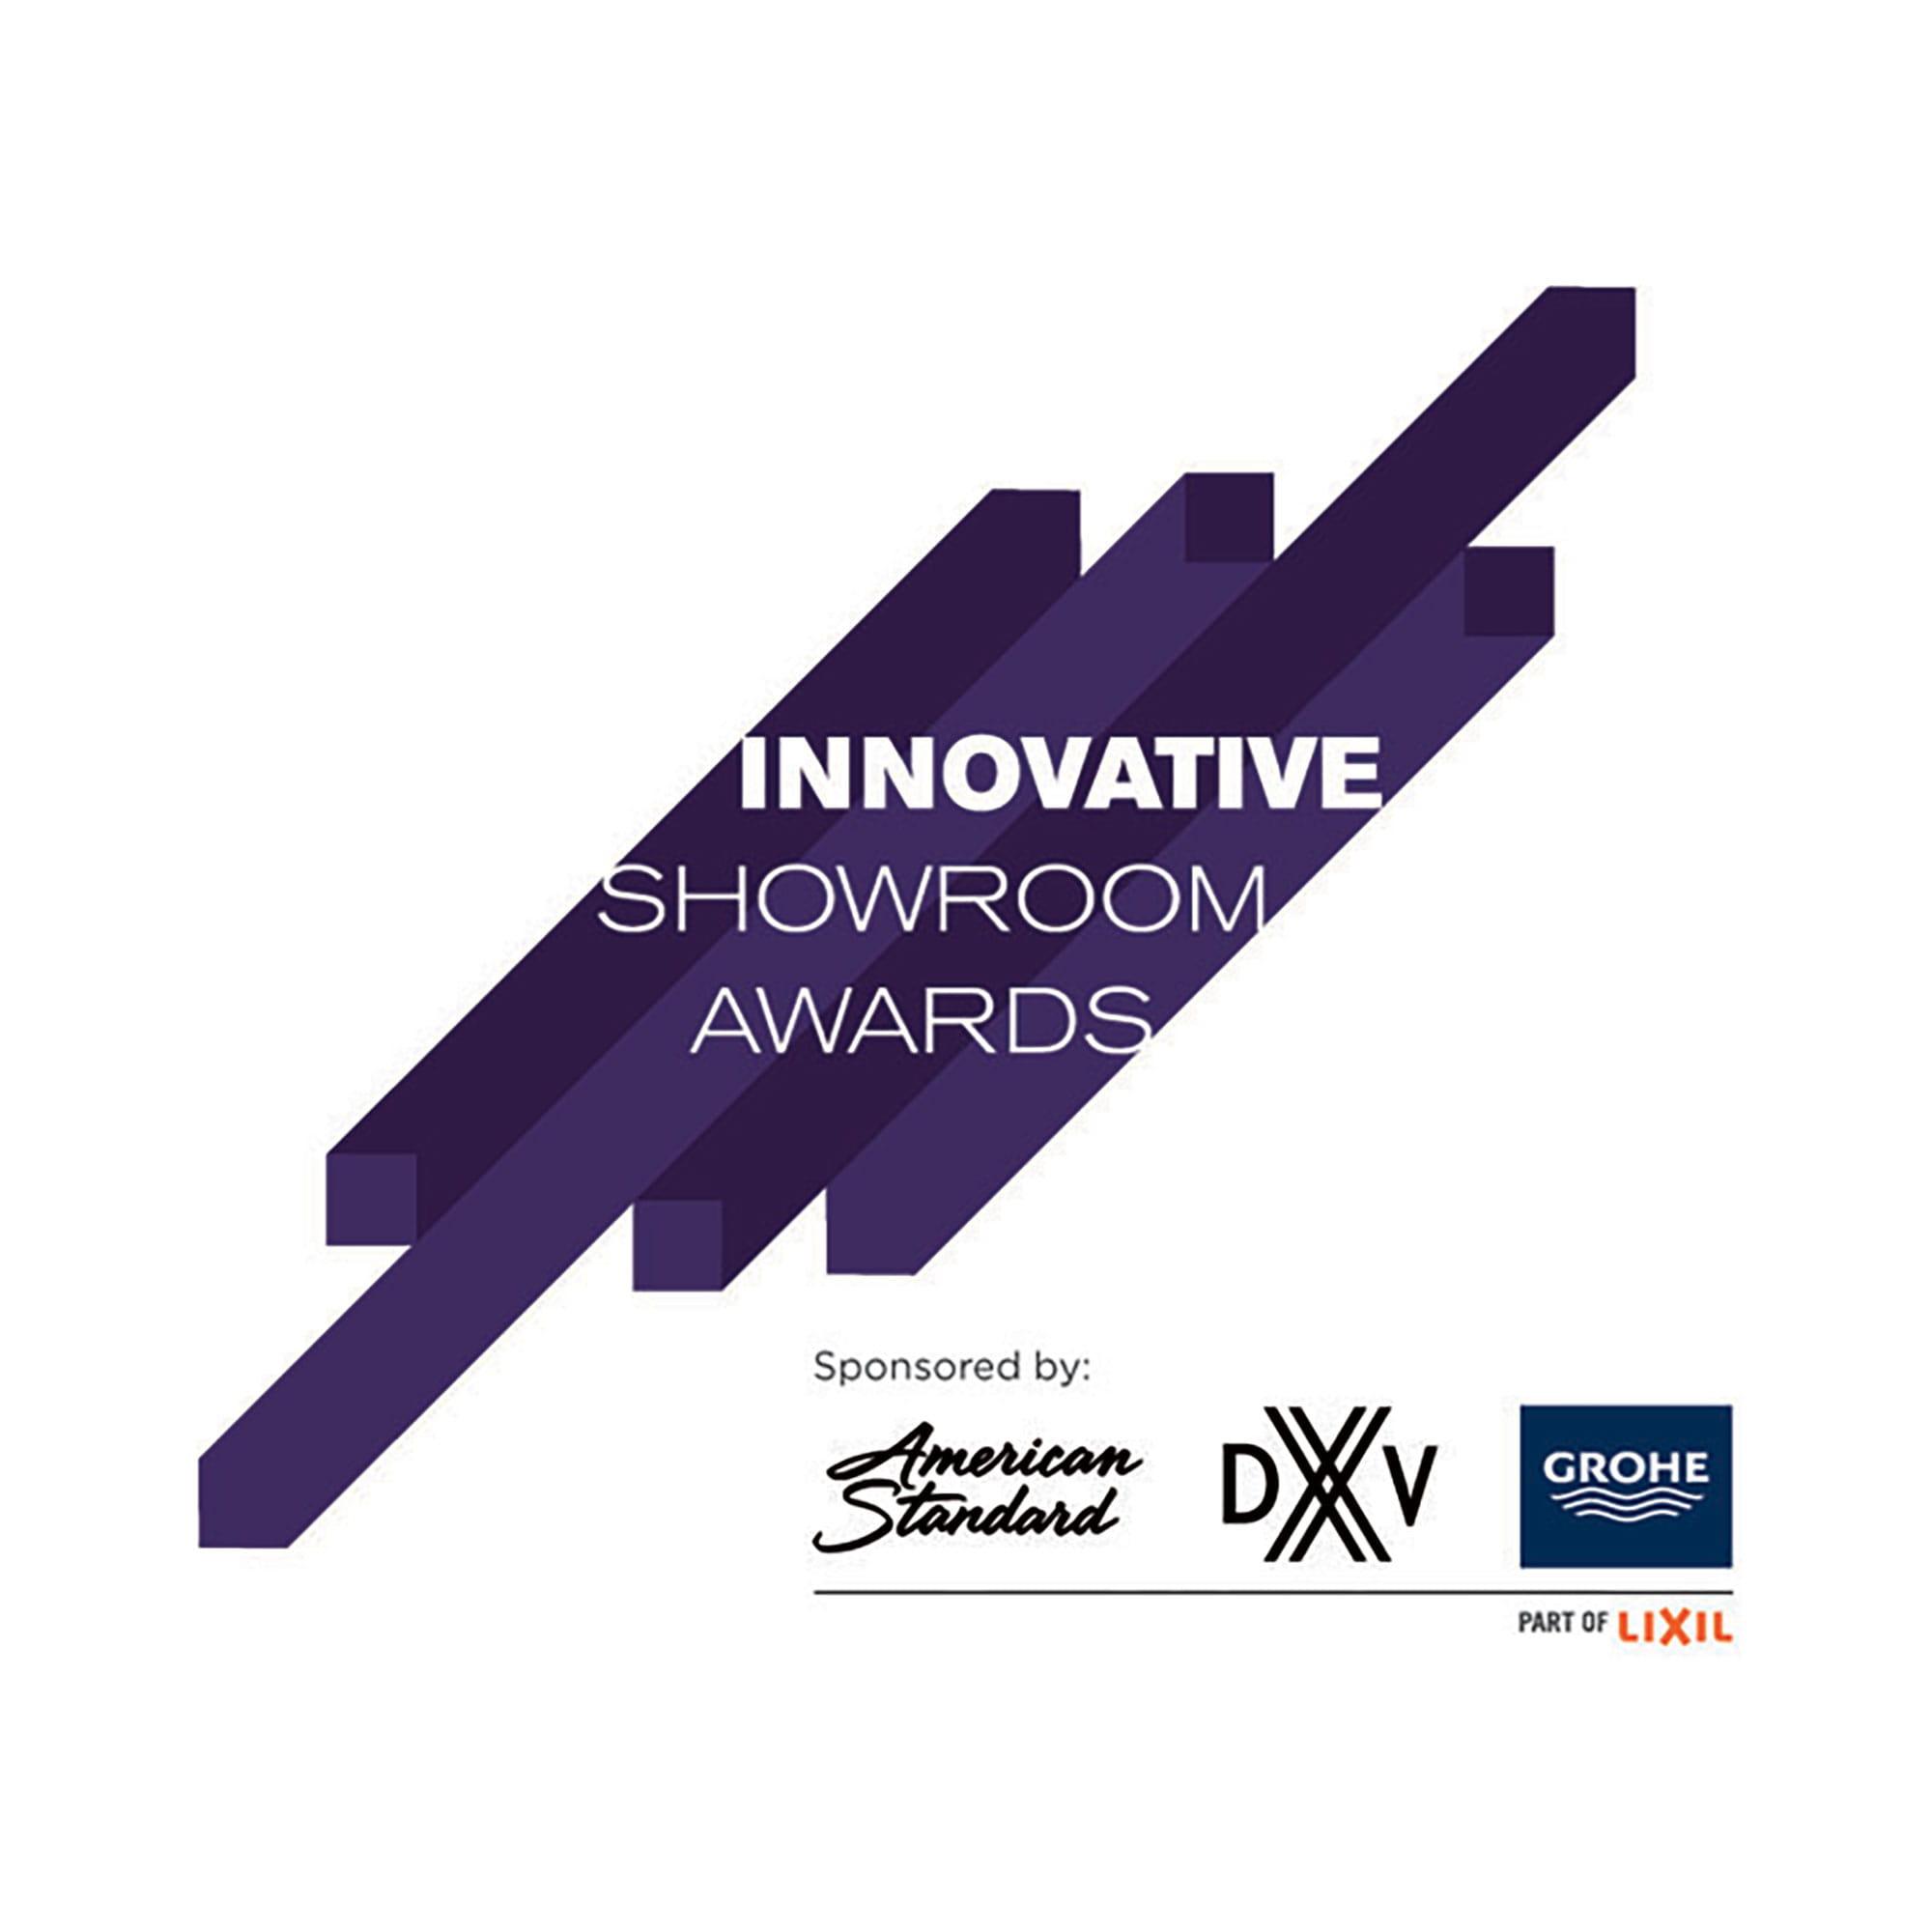 Innovative showroom awards